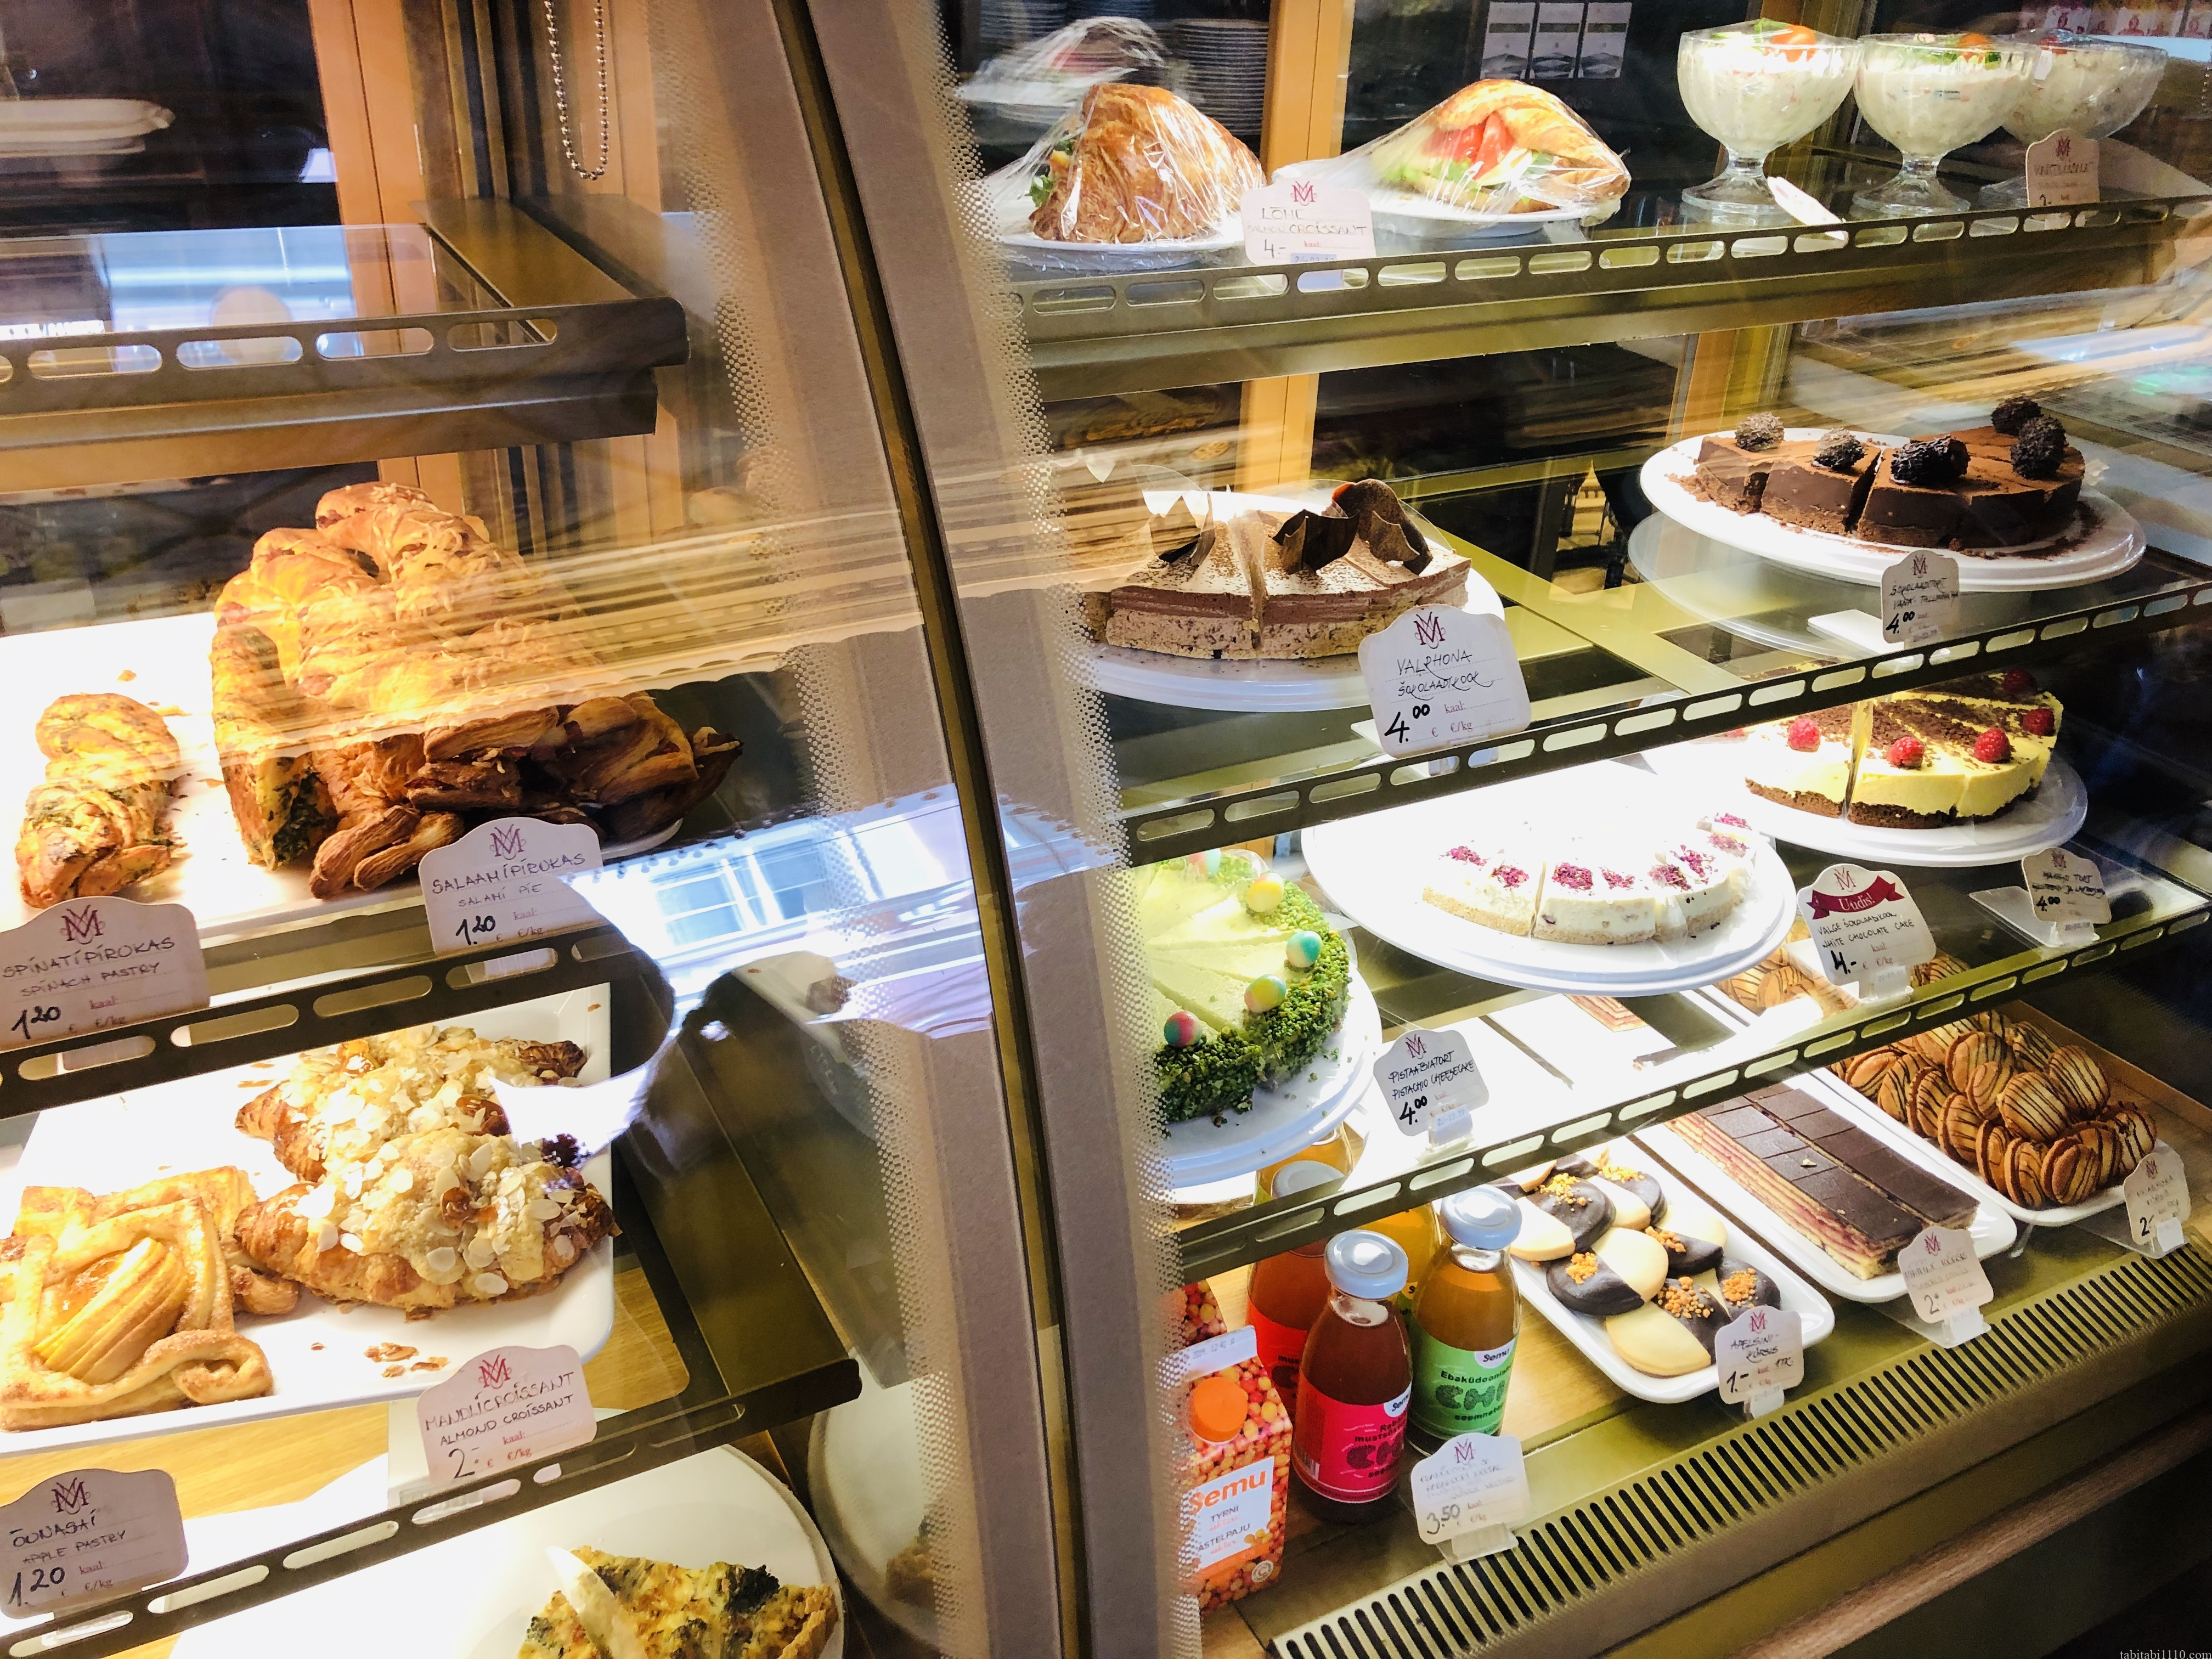 Maiasmokk Cafe